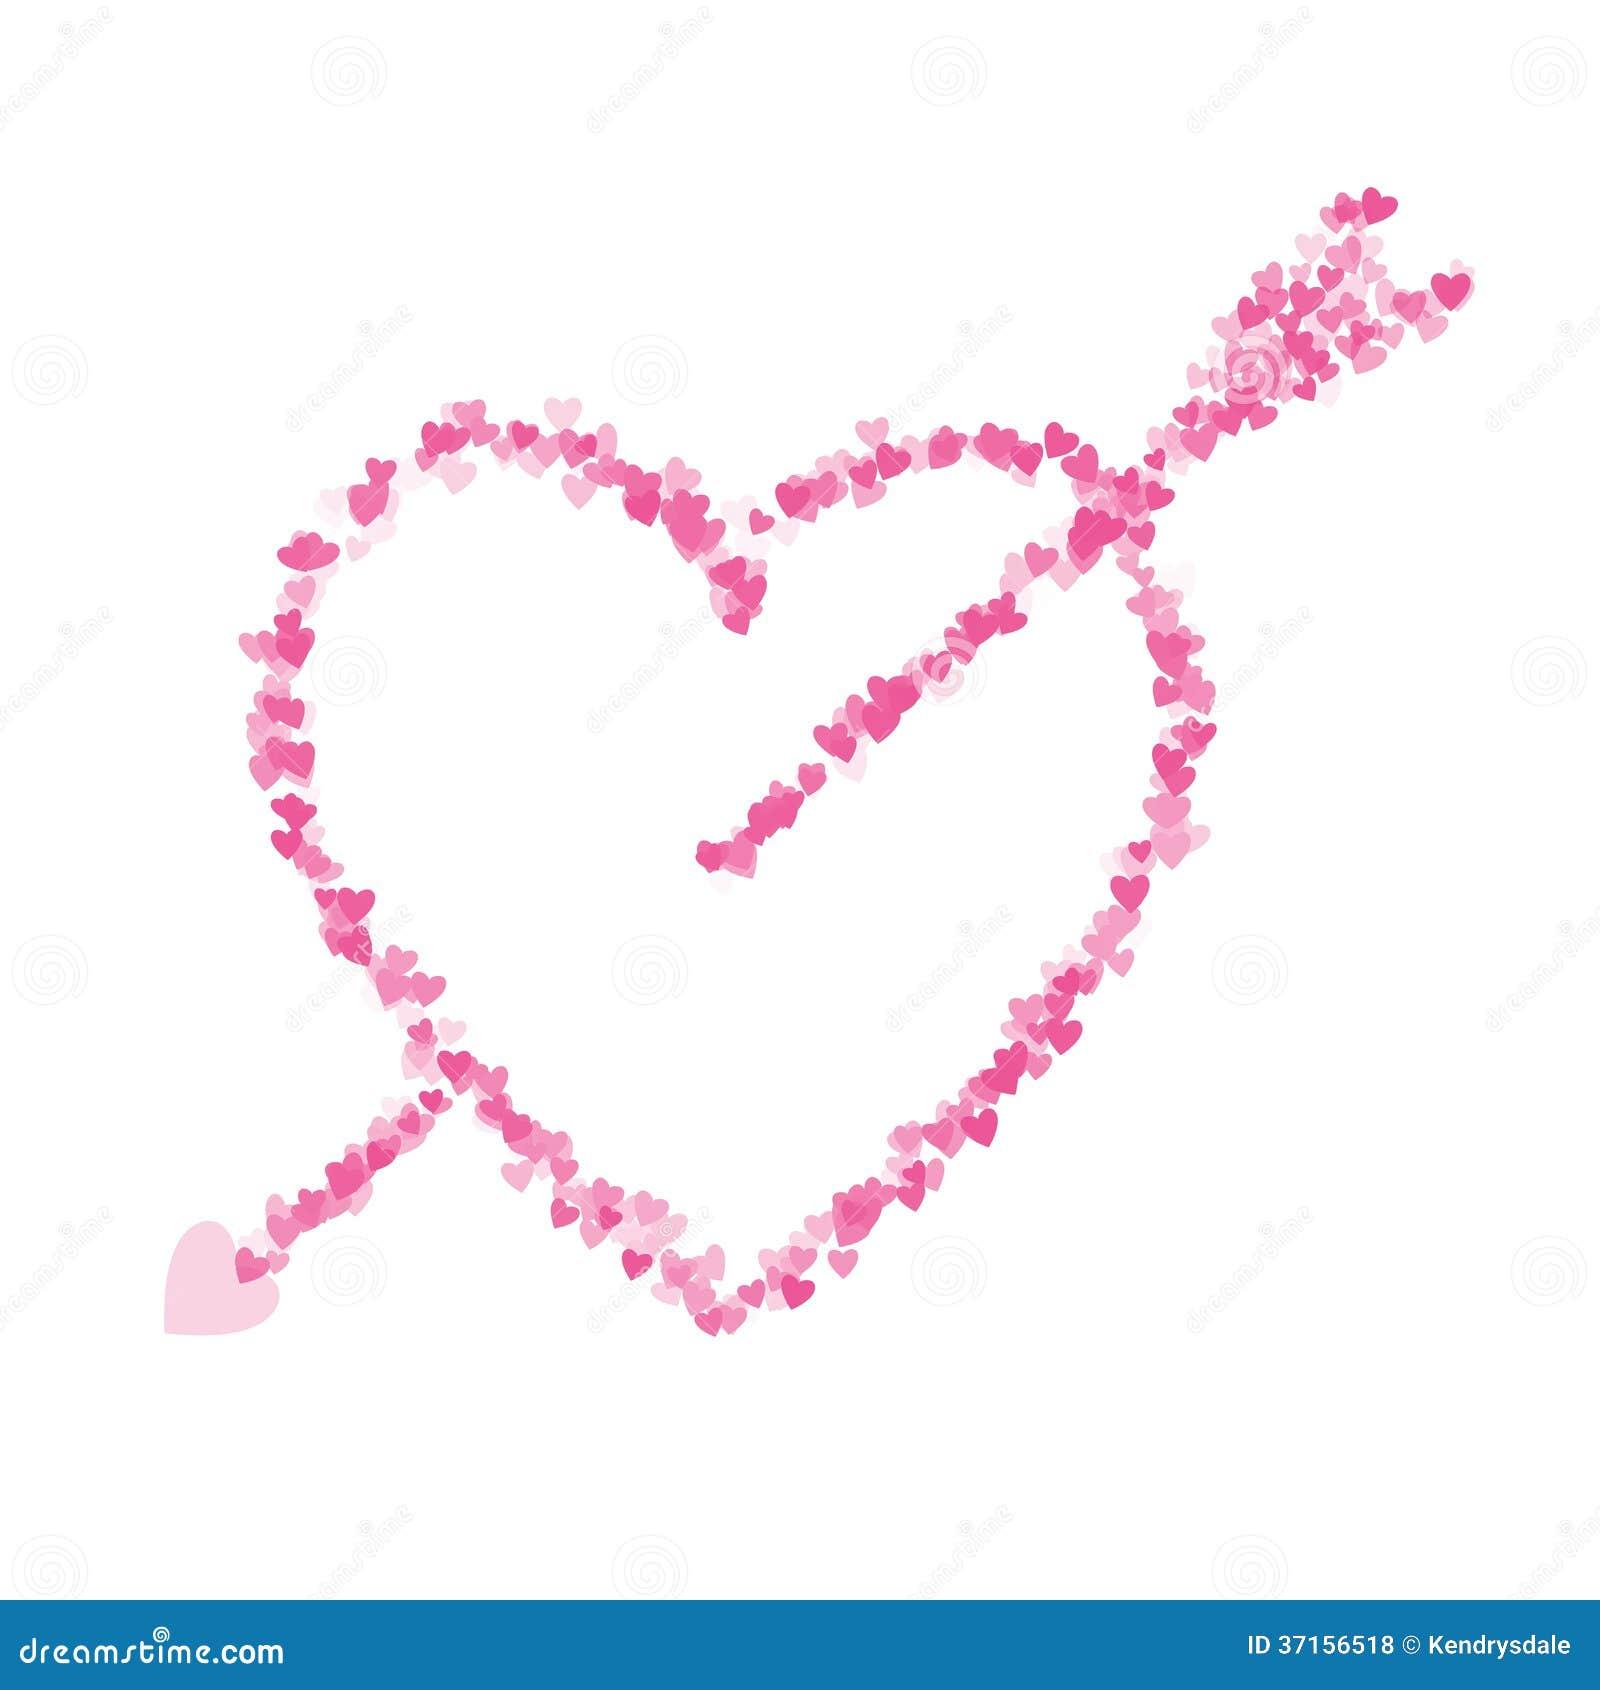 Dating site cupid's arrow